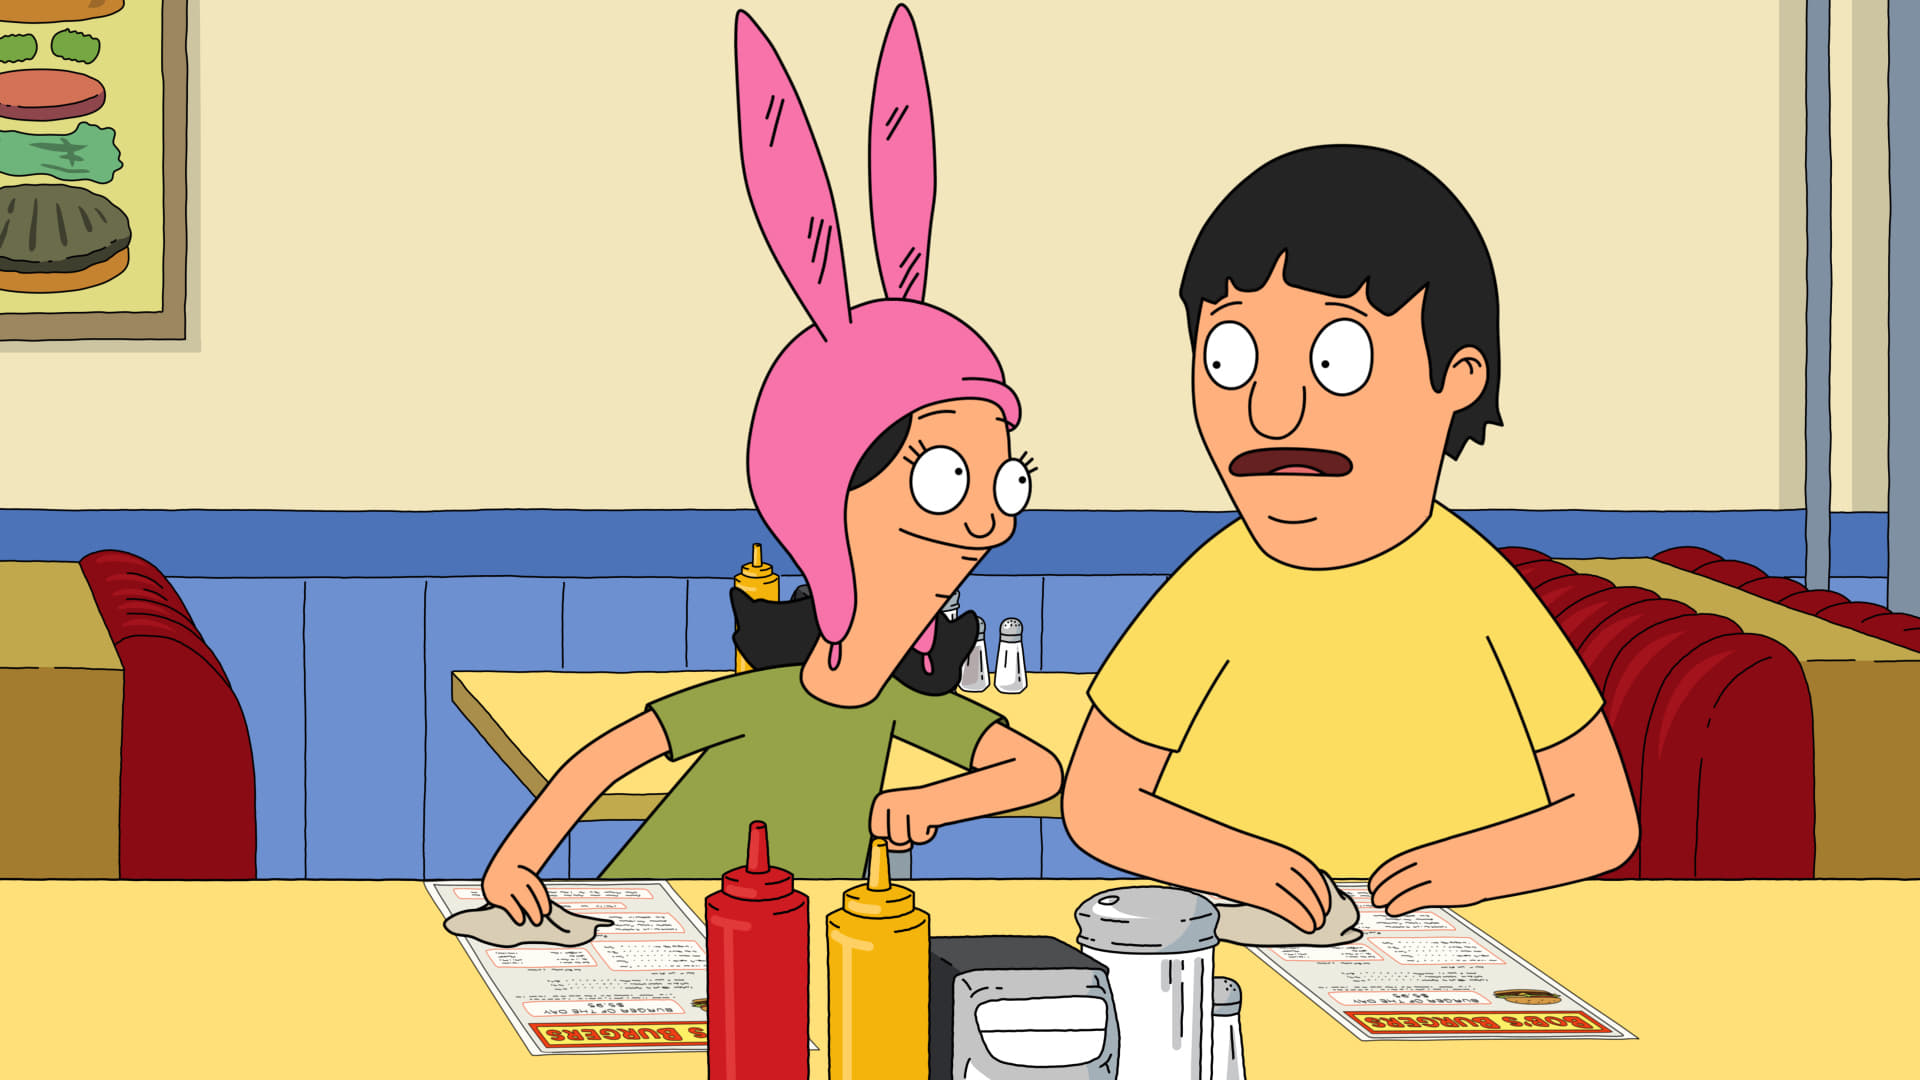 bobs burgers season 7 episode 11 watch online